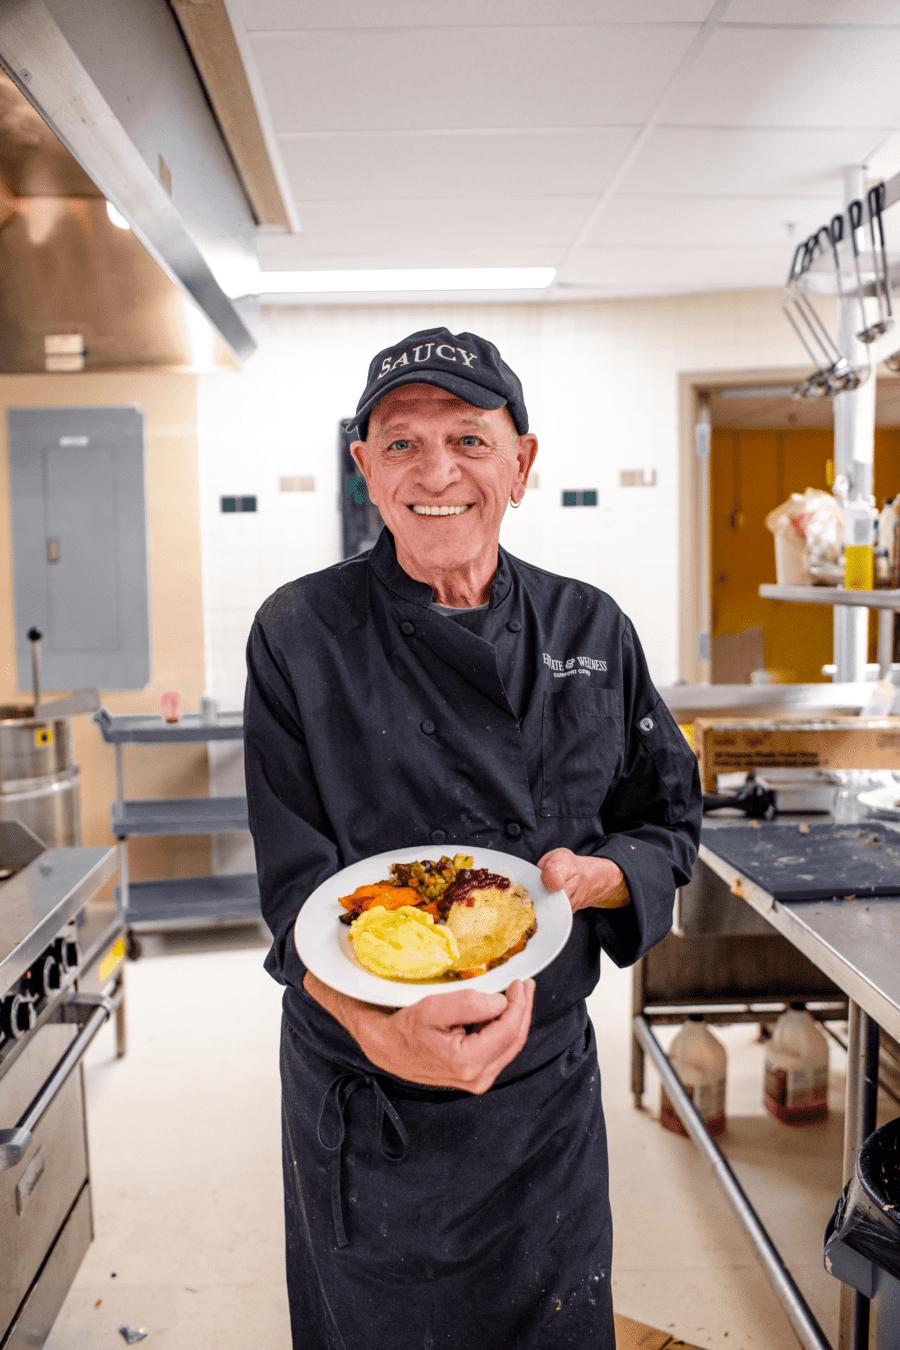 Greg Couillard Bellwood Health Services Chef